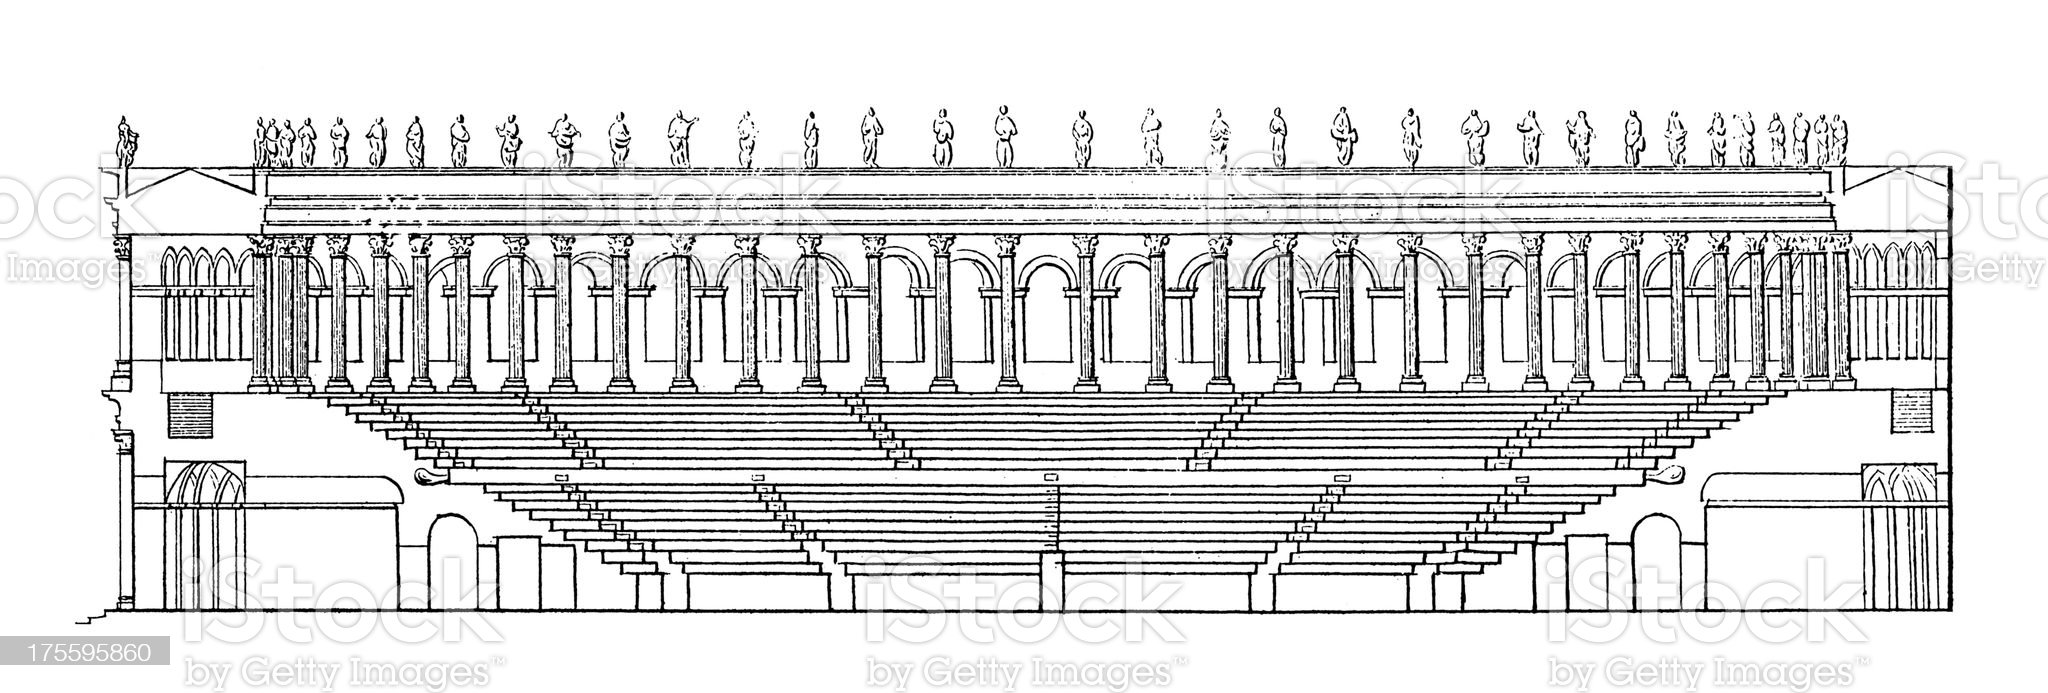 Ancient Roman Amphitheatre   Antique Architectural Illustrations royalty-free stock vector art